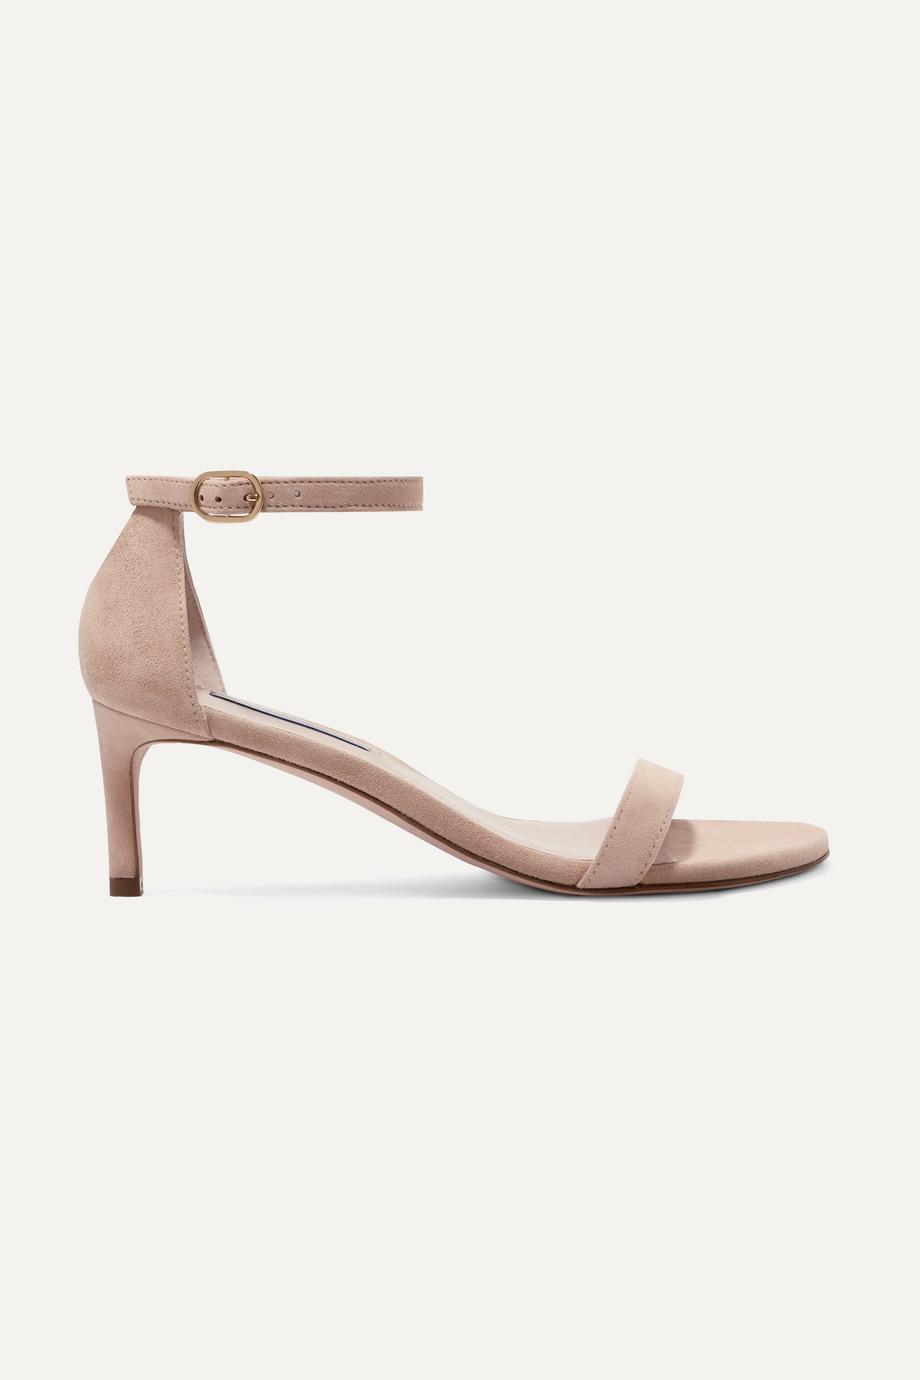 Stuart Weitzman Nunaked suede sandals